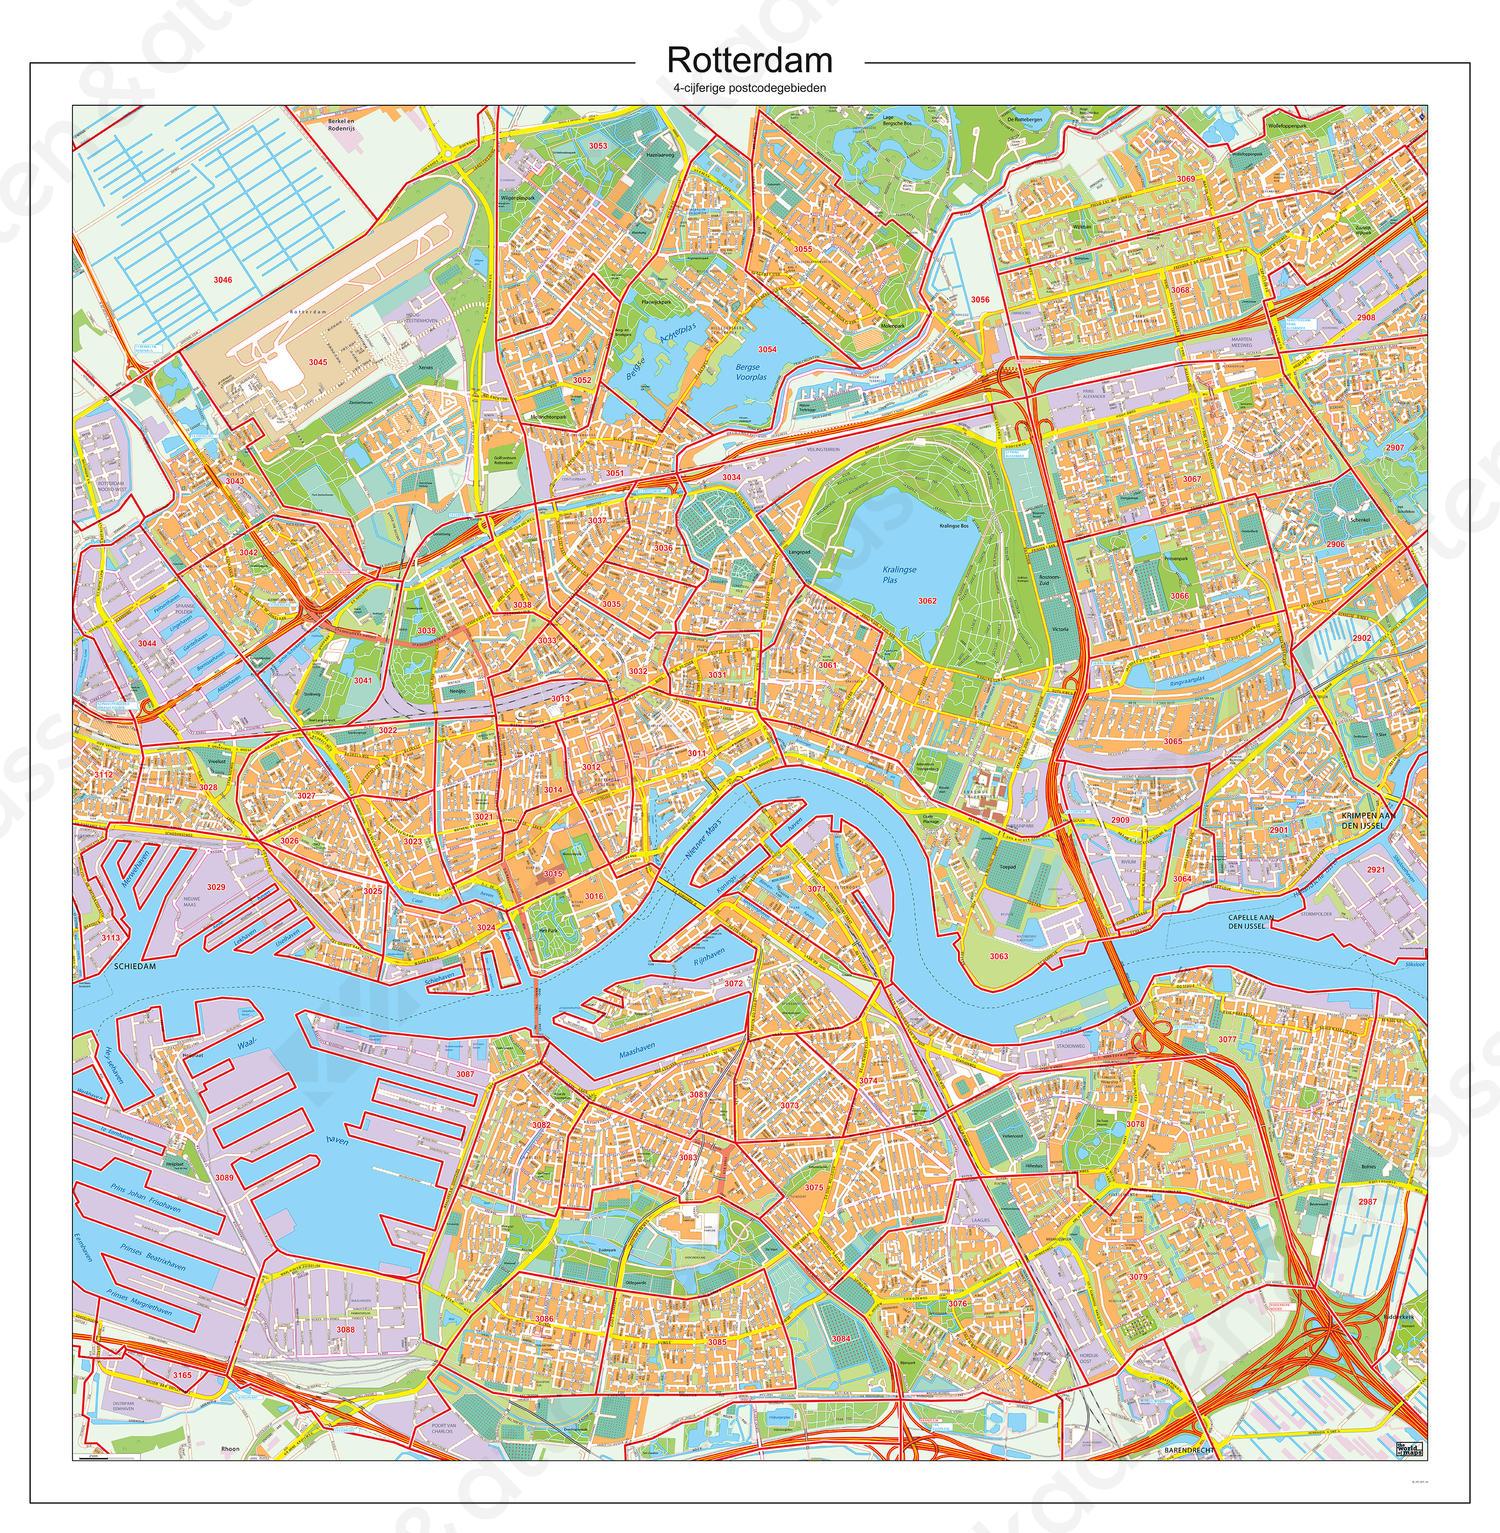 Postcodekaart Rotterdam